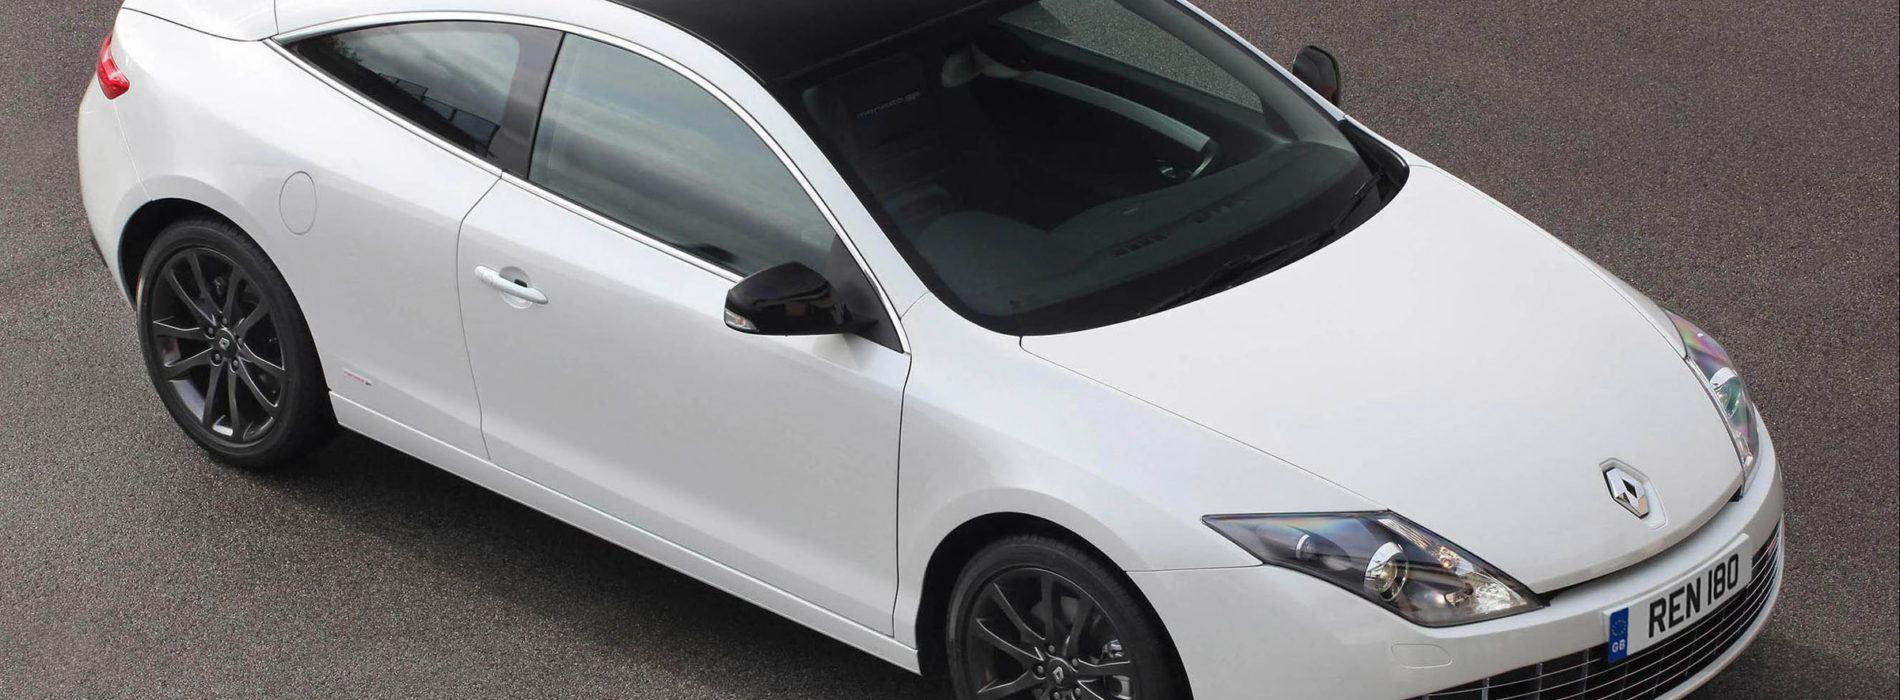 Nuevo Renault Laguna Coupé